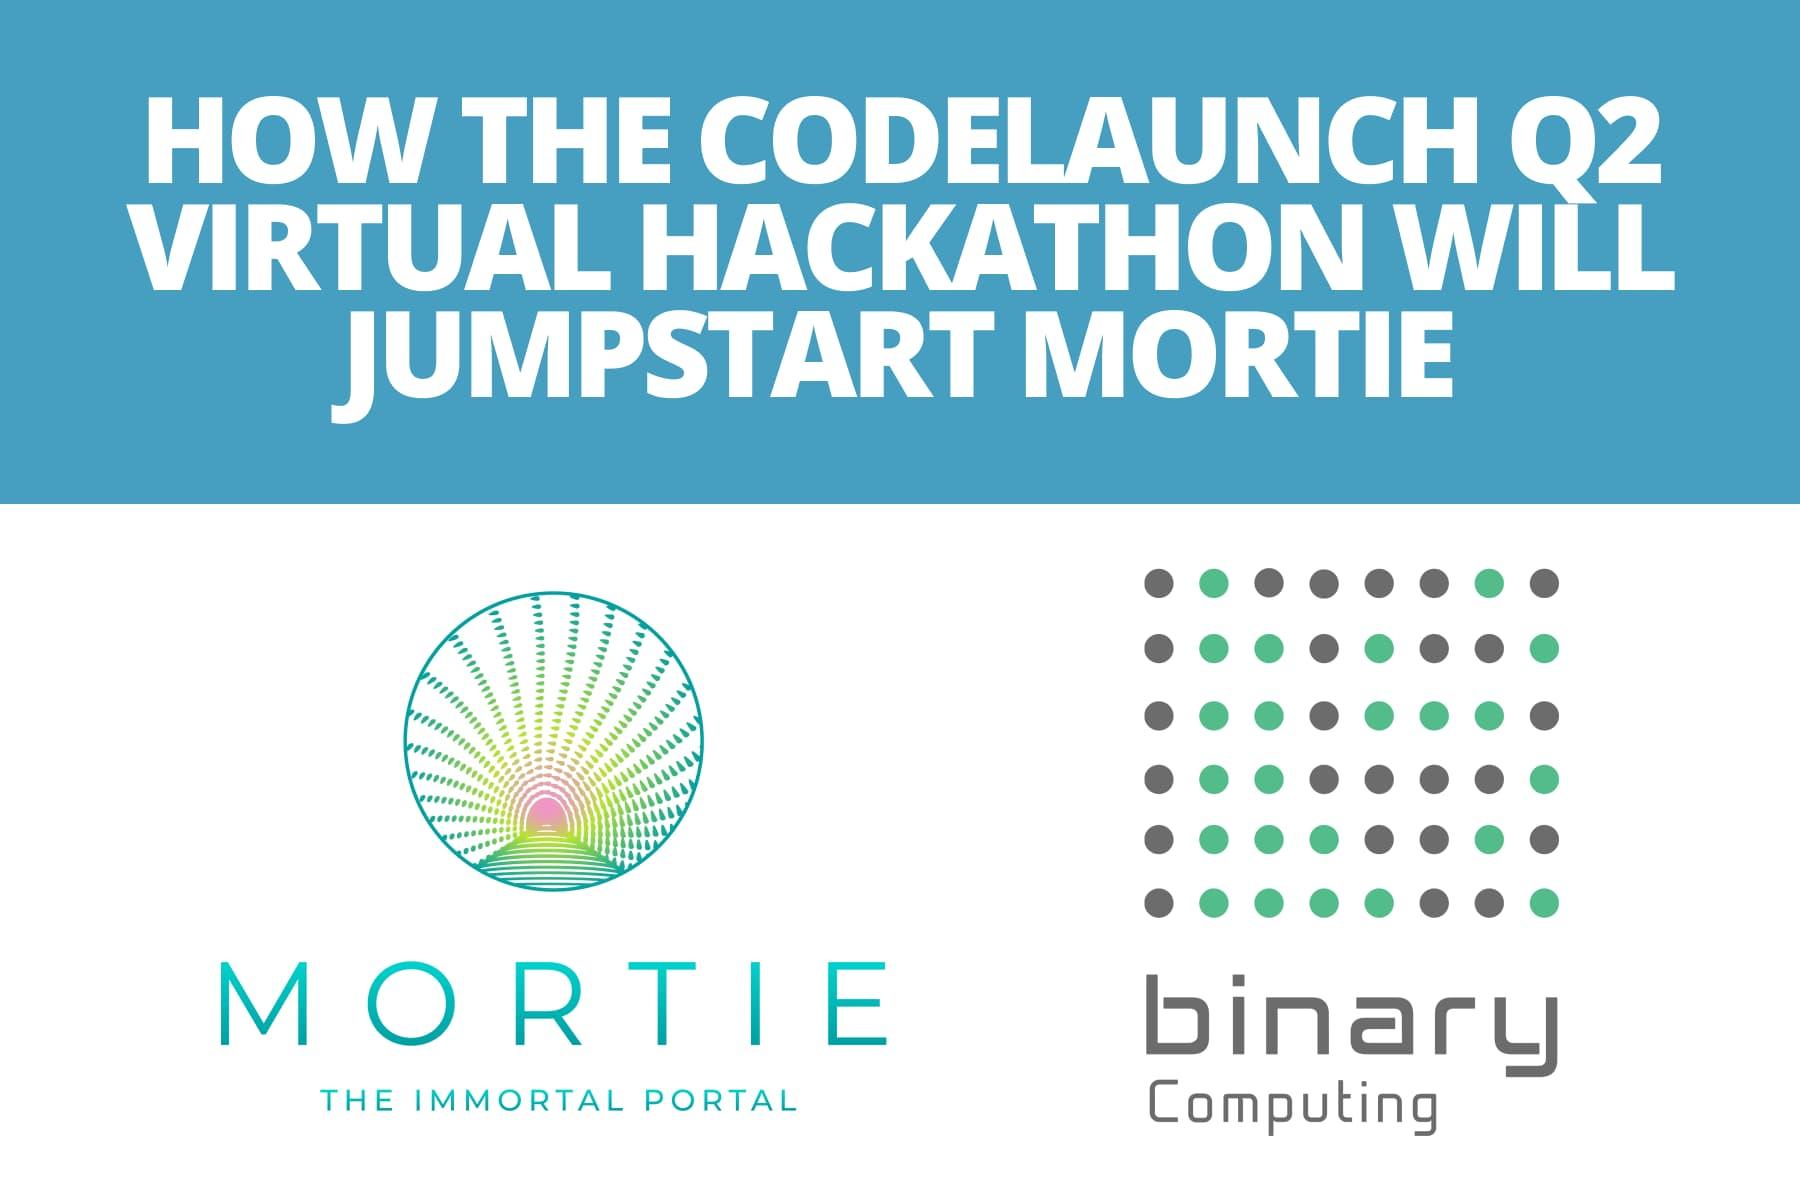 How the CodeLaunch Q2 Virtual Hackathon Will Jumpstart Mortie